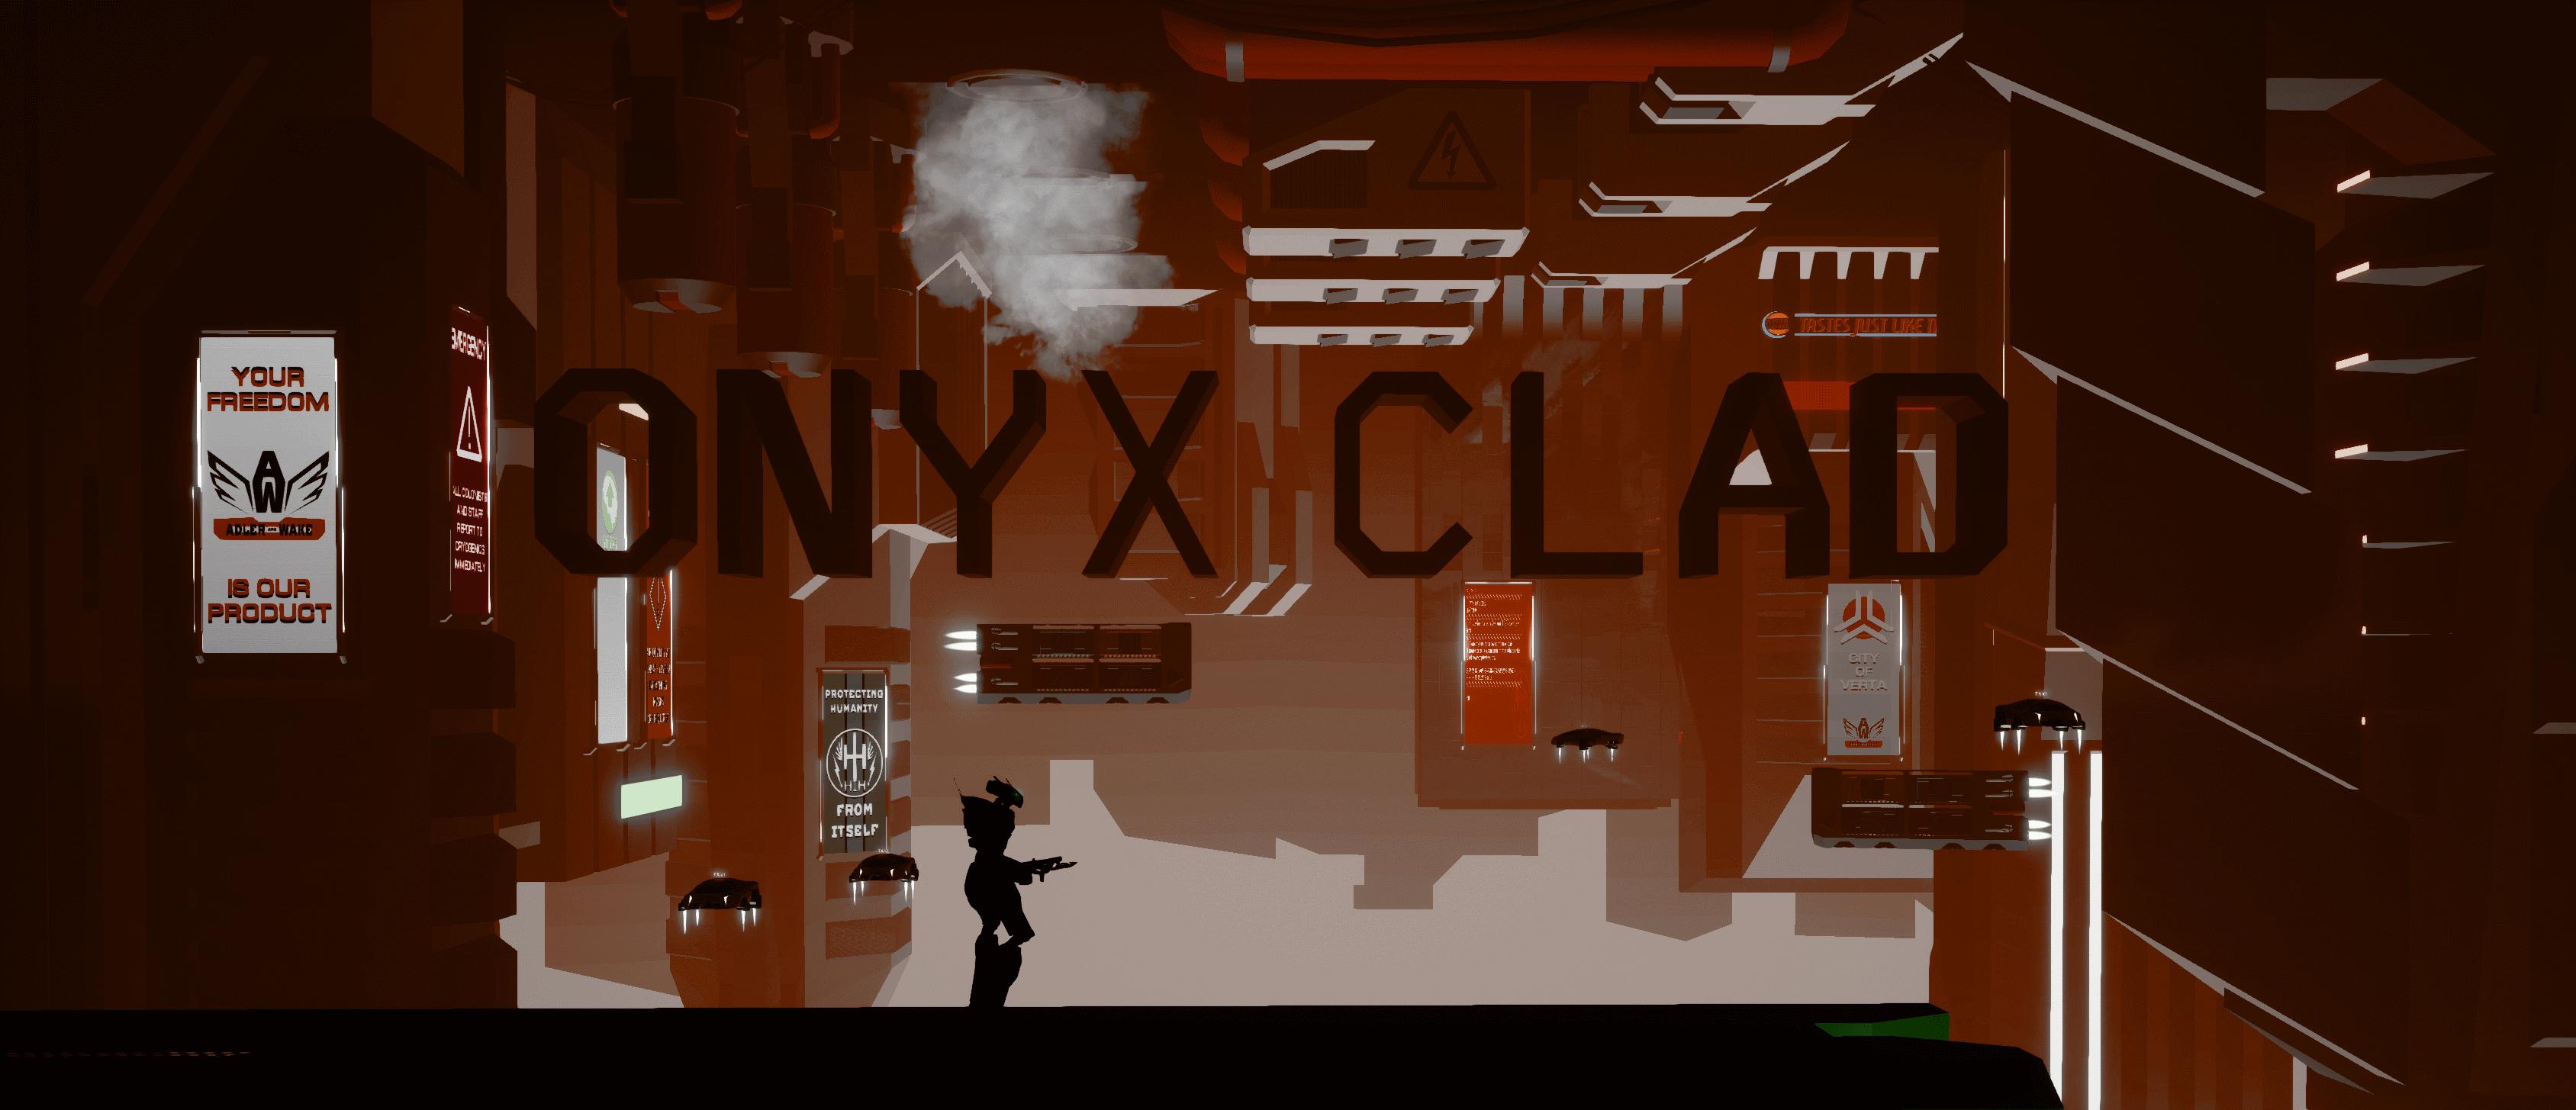 ONYX CLAD (PC) Shooter kostenlos (itch.io)